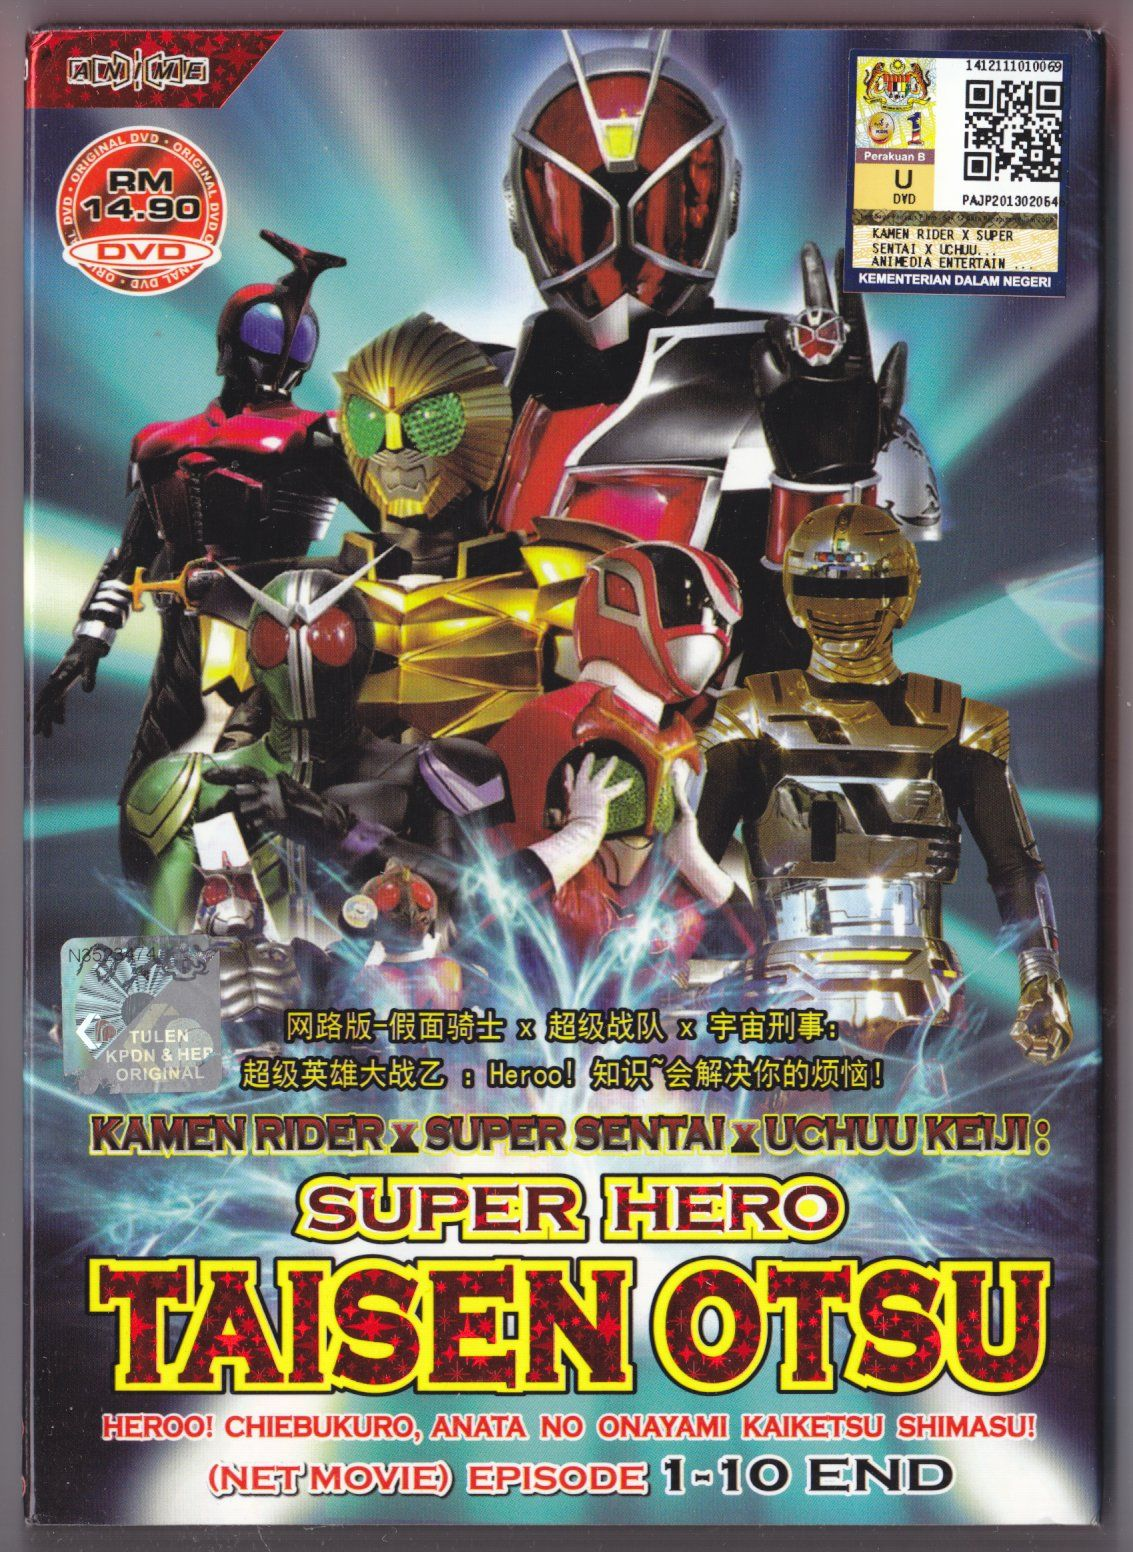 GEEK B-ROLL - Tokusatsu Review: Kamen Rider X Super Sentai X